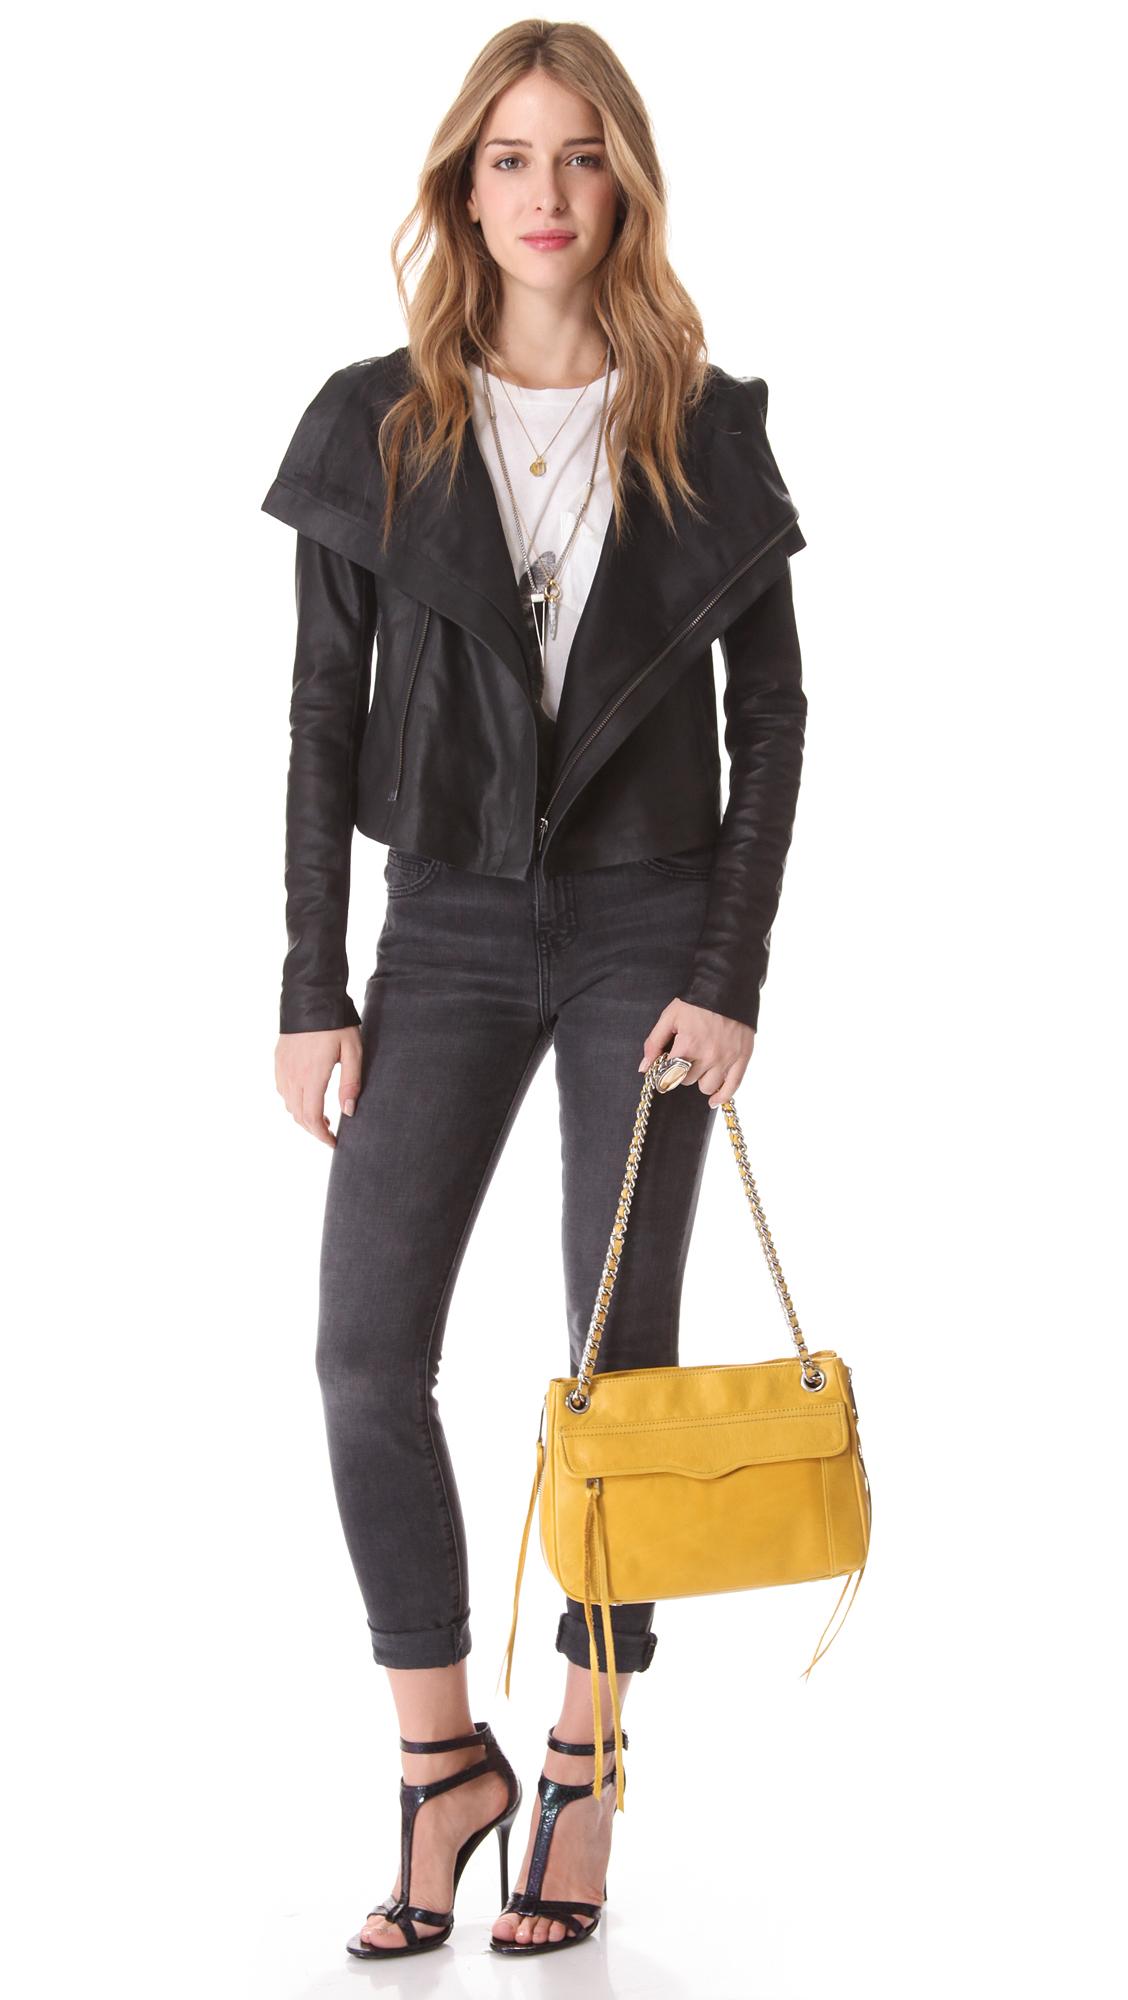 Rebecca Minkoff Swing Bag  f32495043a821